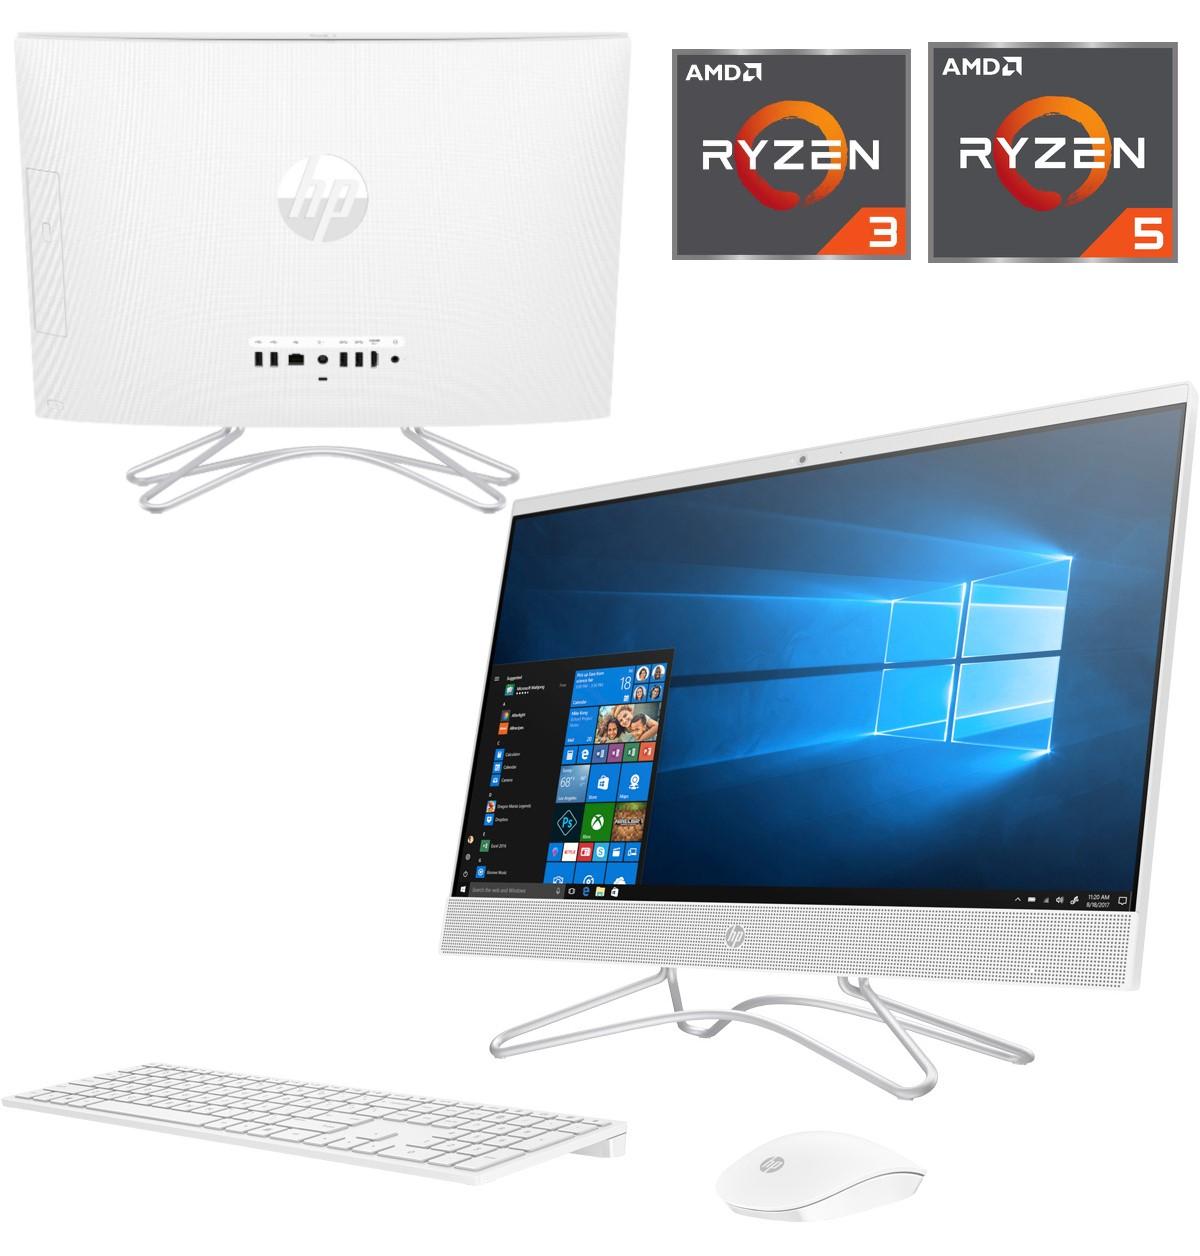 "All in One HP 24"" FHD IPS, AMD Ryzen 3 3200U, 8 GB, 512 GB SSD / R5 3500U a 519€"